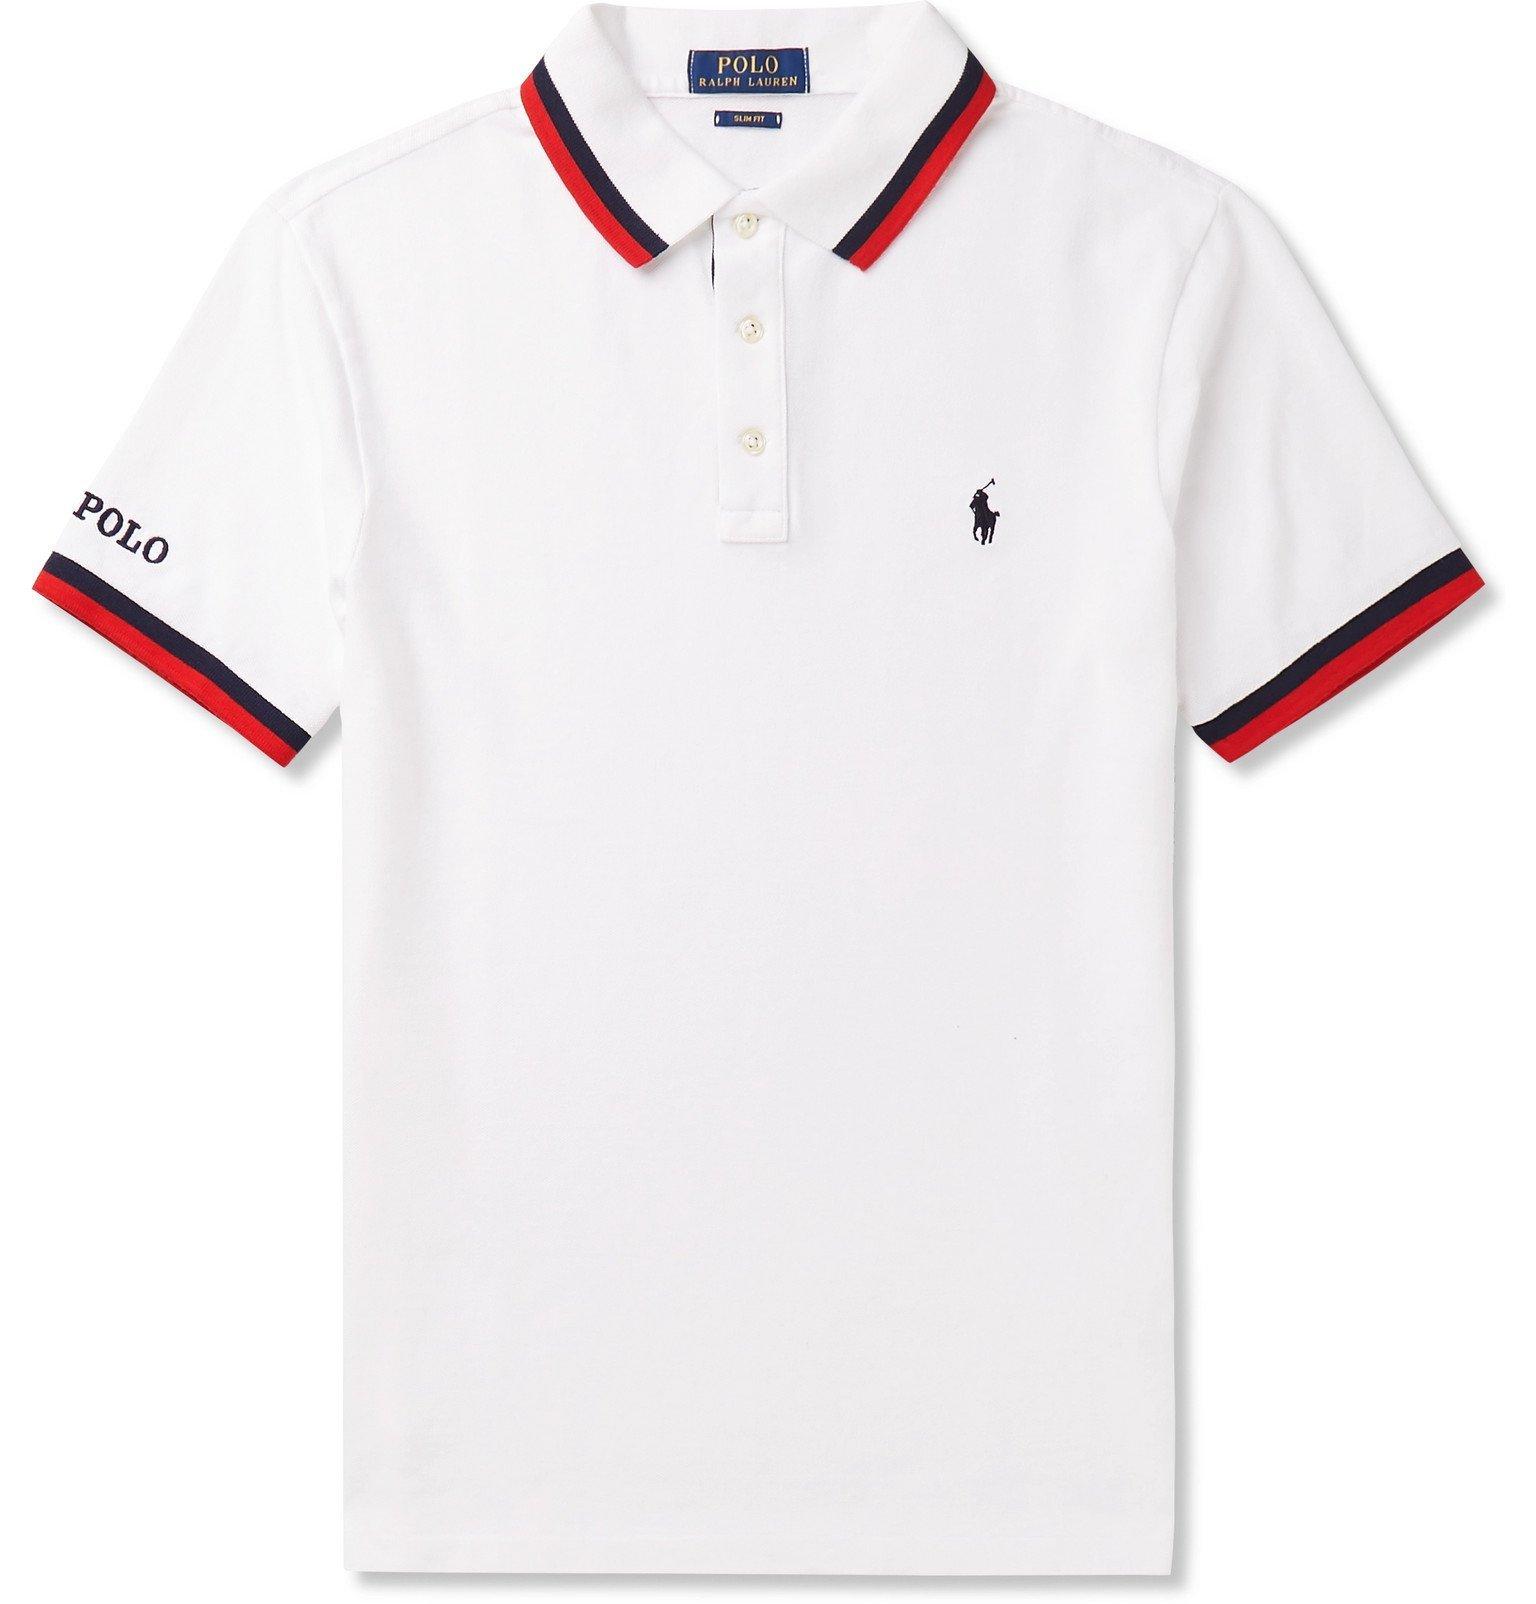 Polo Ralph Lauren - Slim-Fit Contrast-Tipped Cotton-Piqué Polo Shirt - White